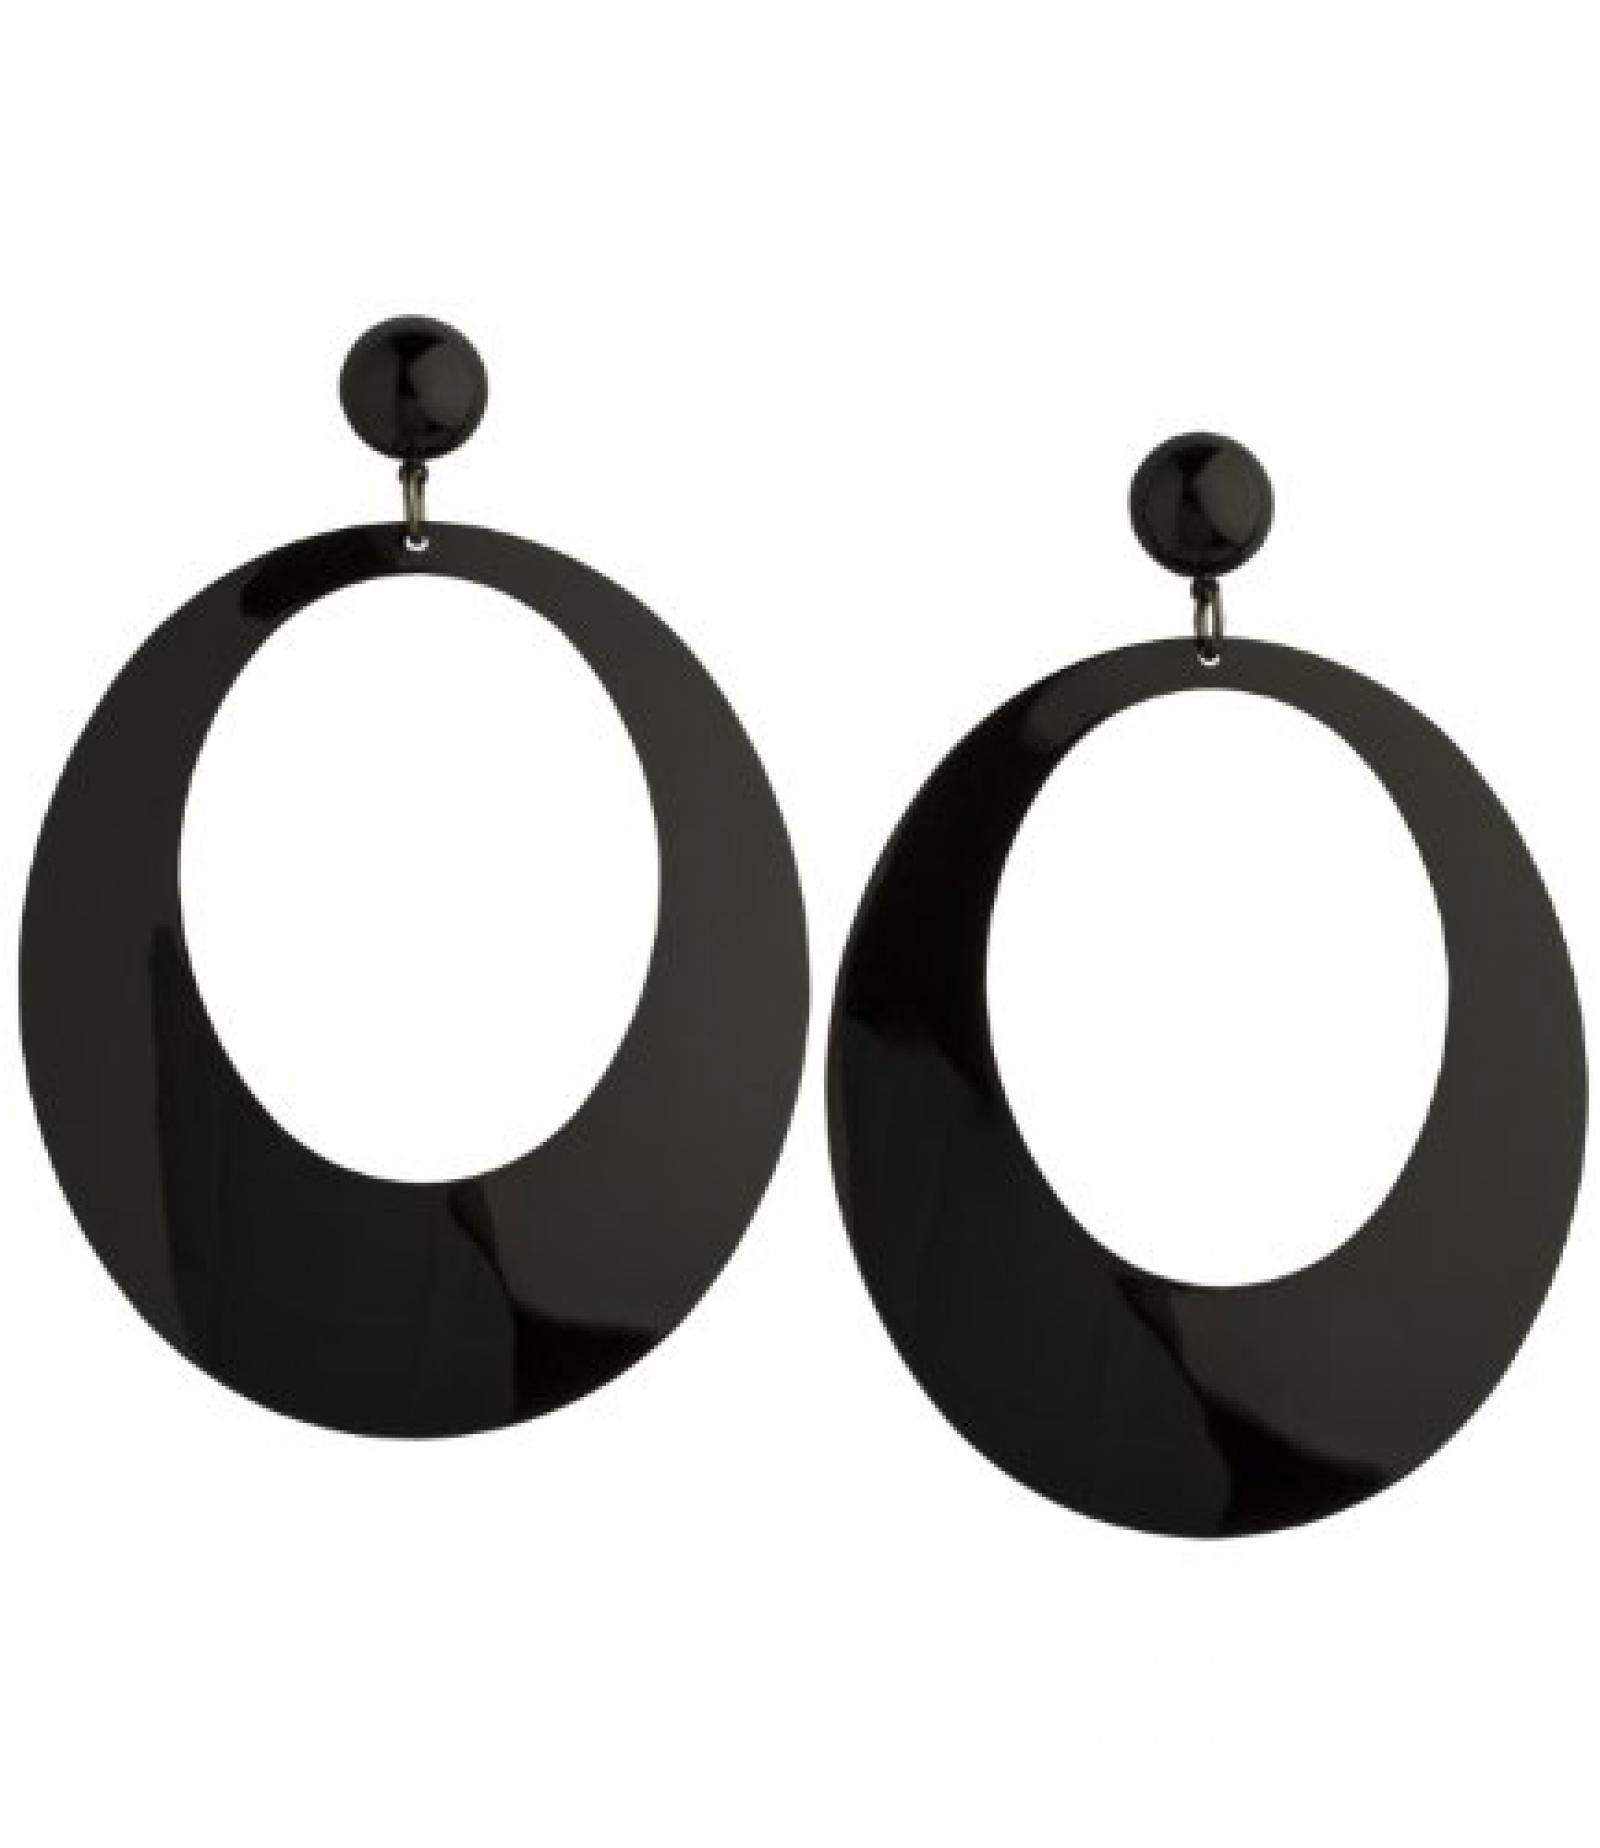 "SIX ""Ming"" große, runde Ohrstecker aus schwarzen Metallplatten (353-719)"